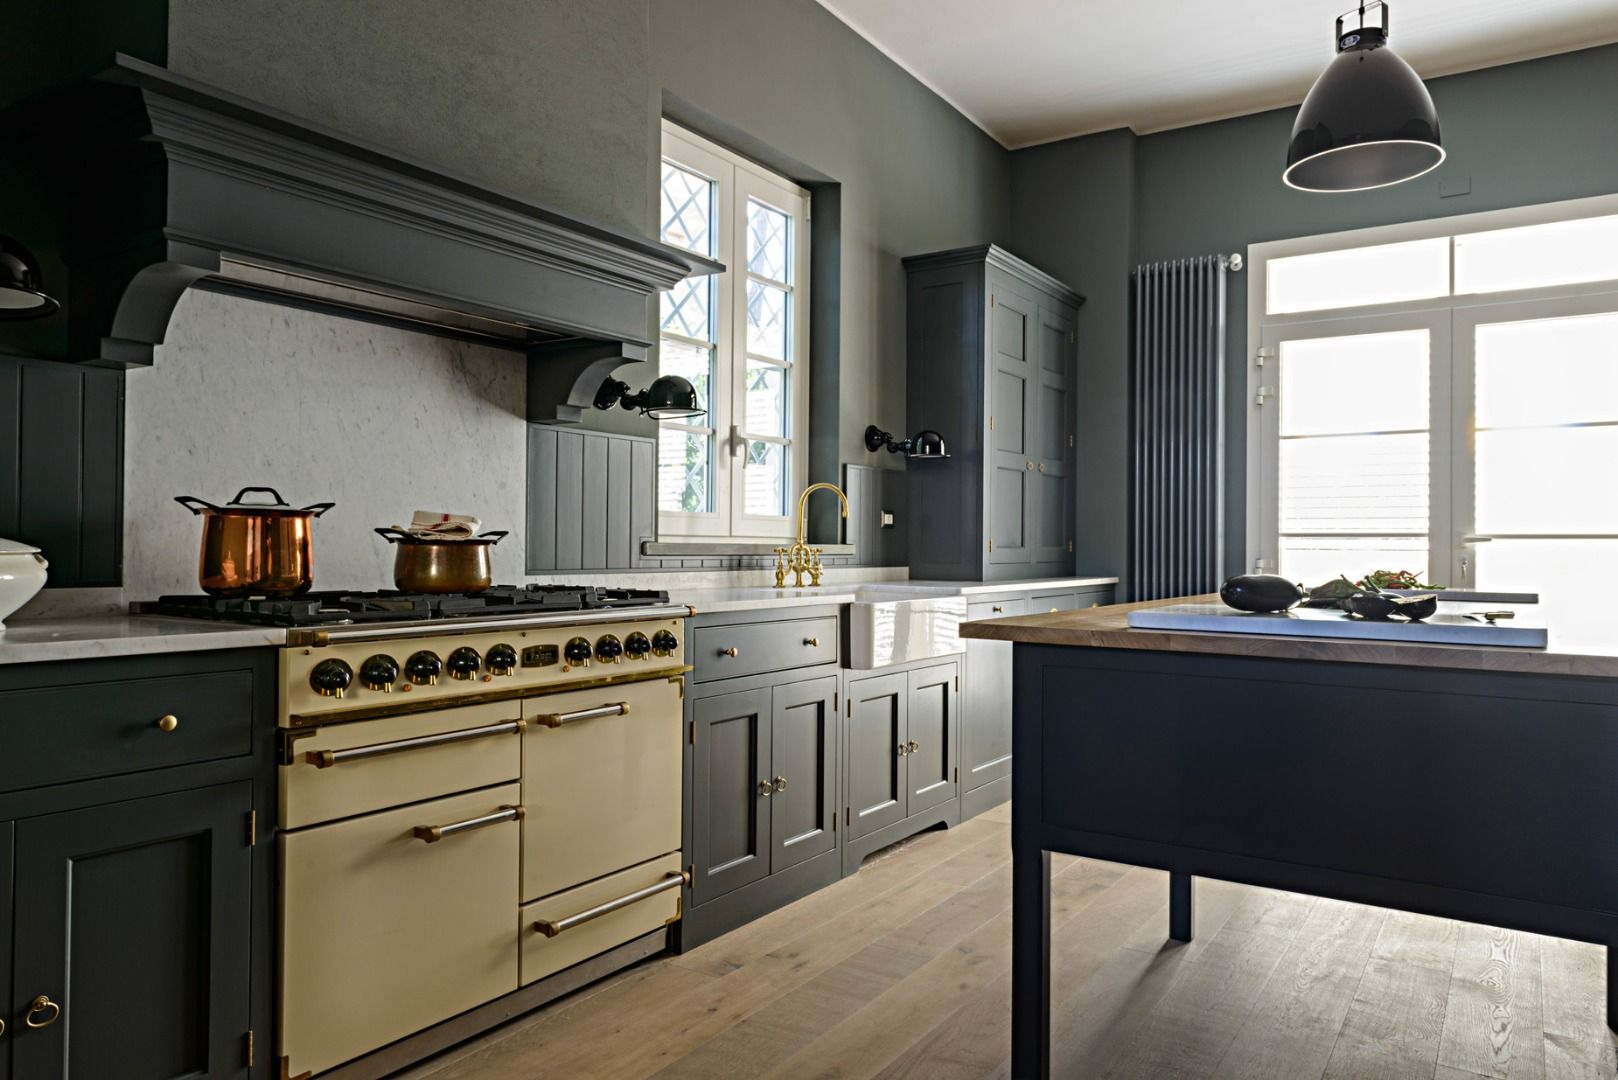 Emejing Cucina Stile Inglese Ideas - Ideas & Design 2017 ...